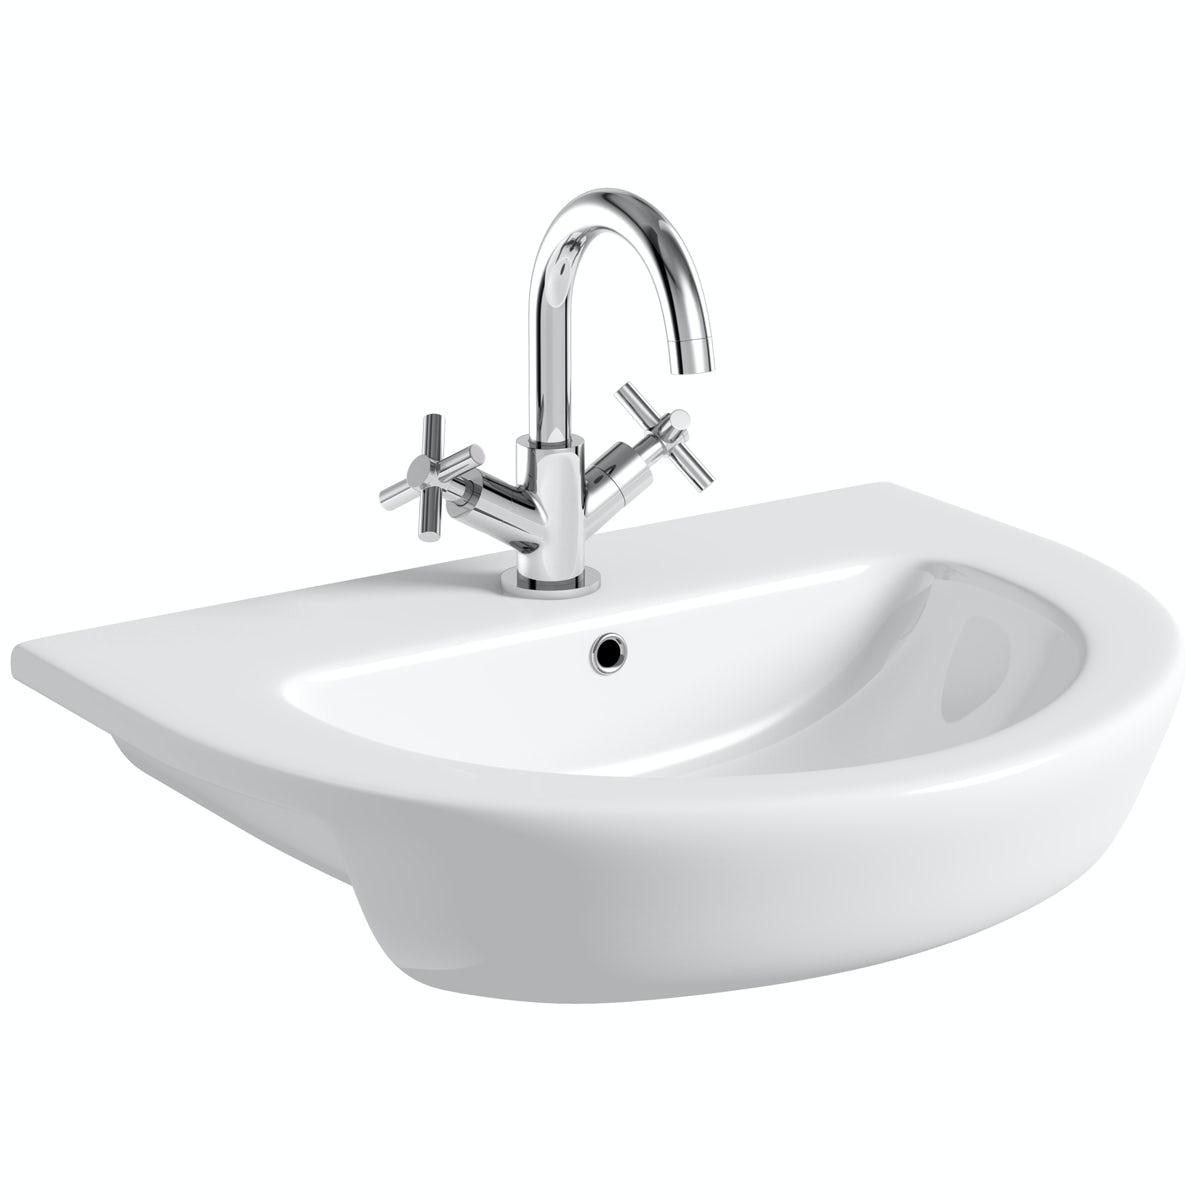 Mode Tate semi recessed basin